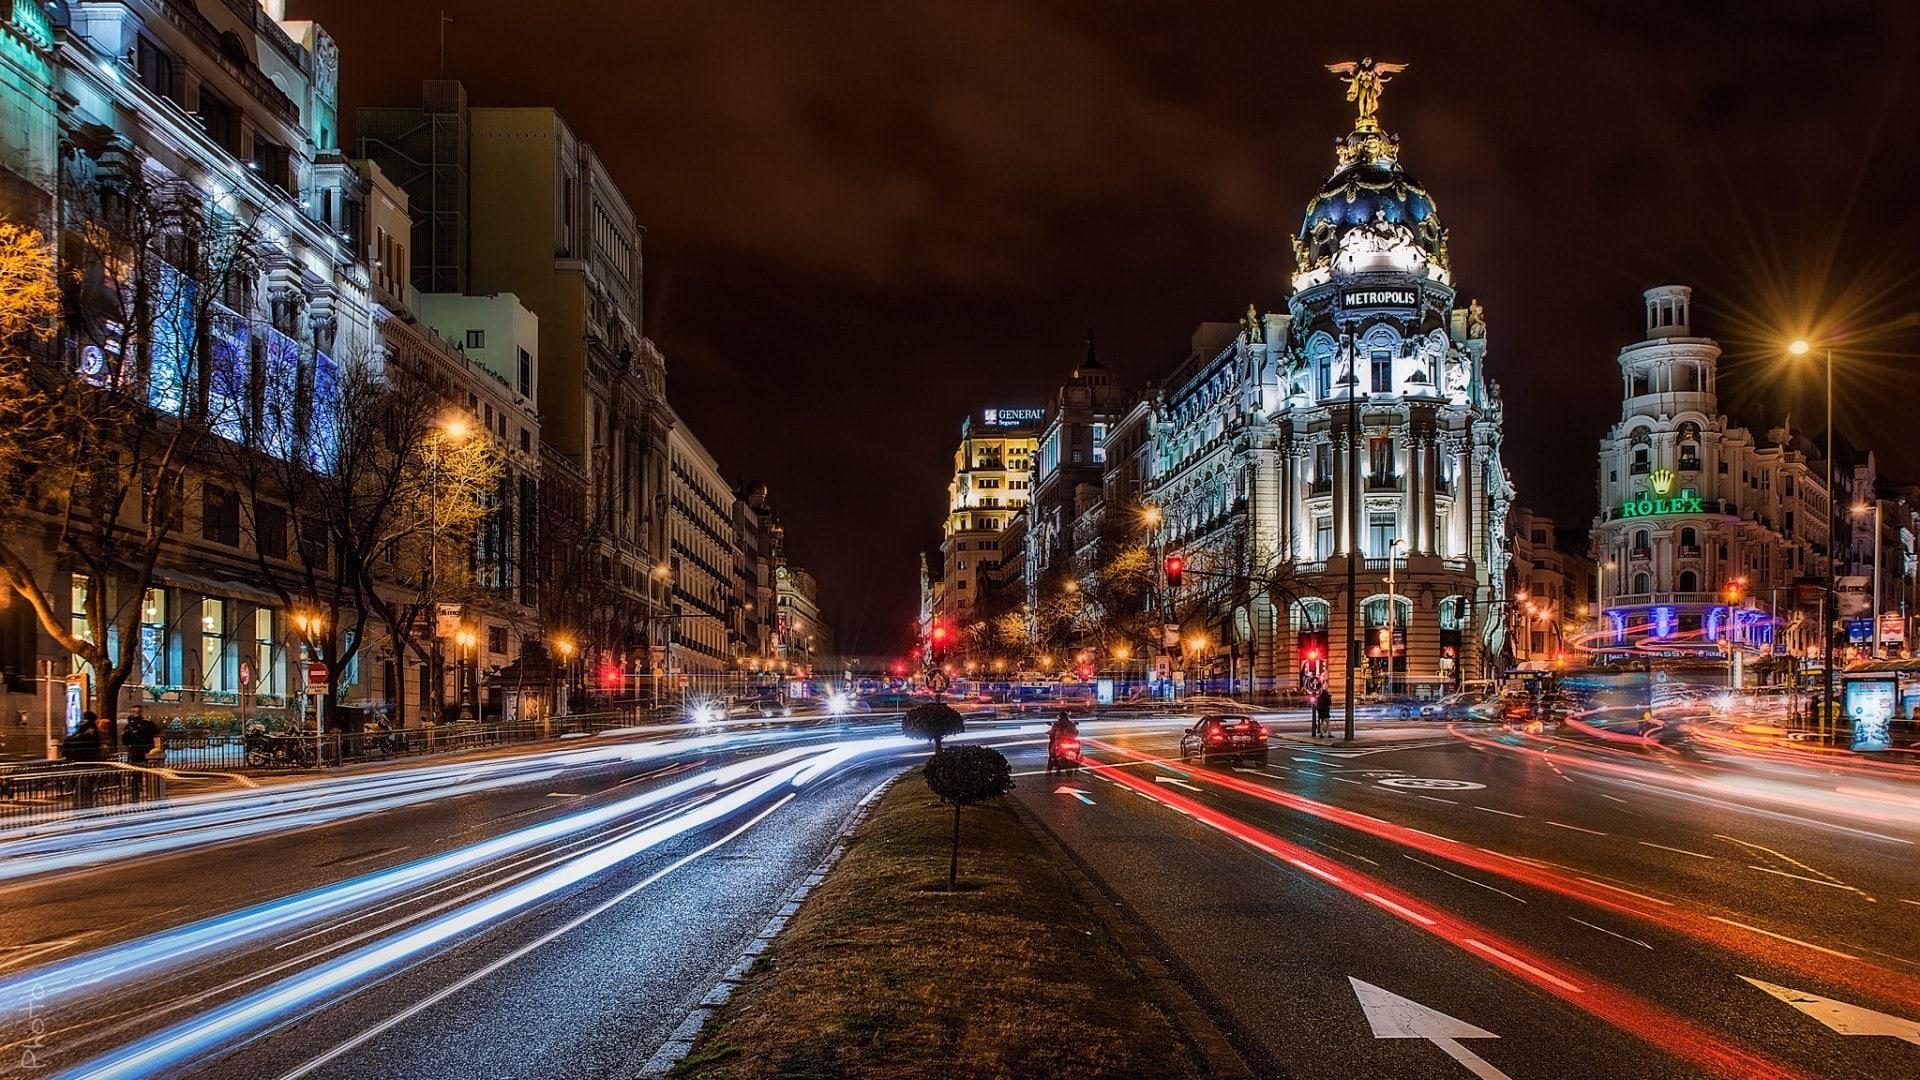 Madrid widescreen for desktop